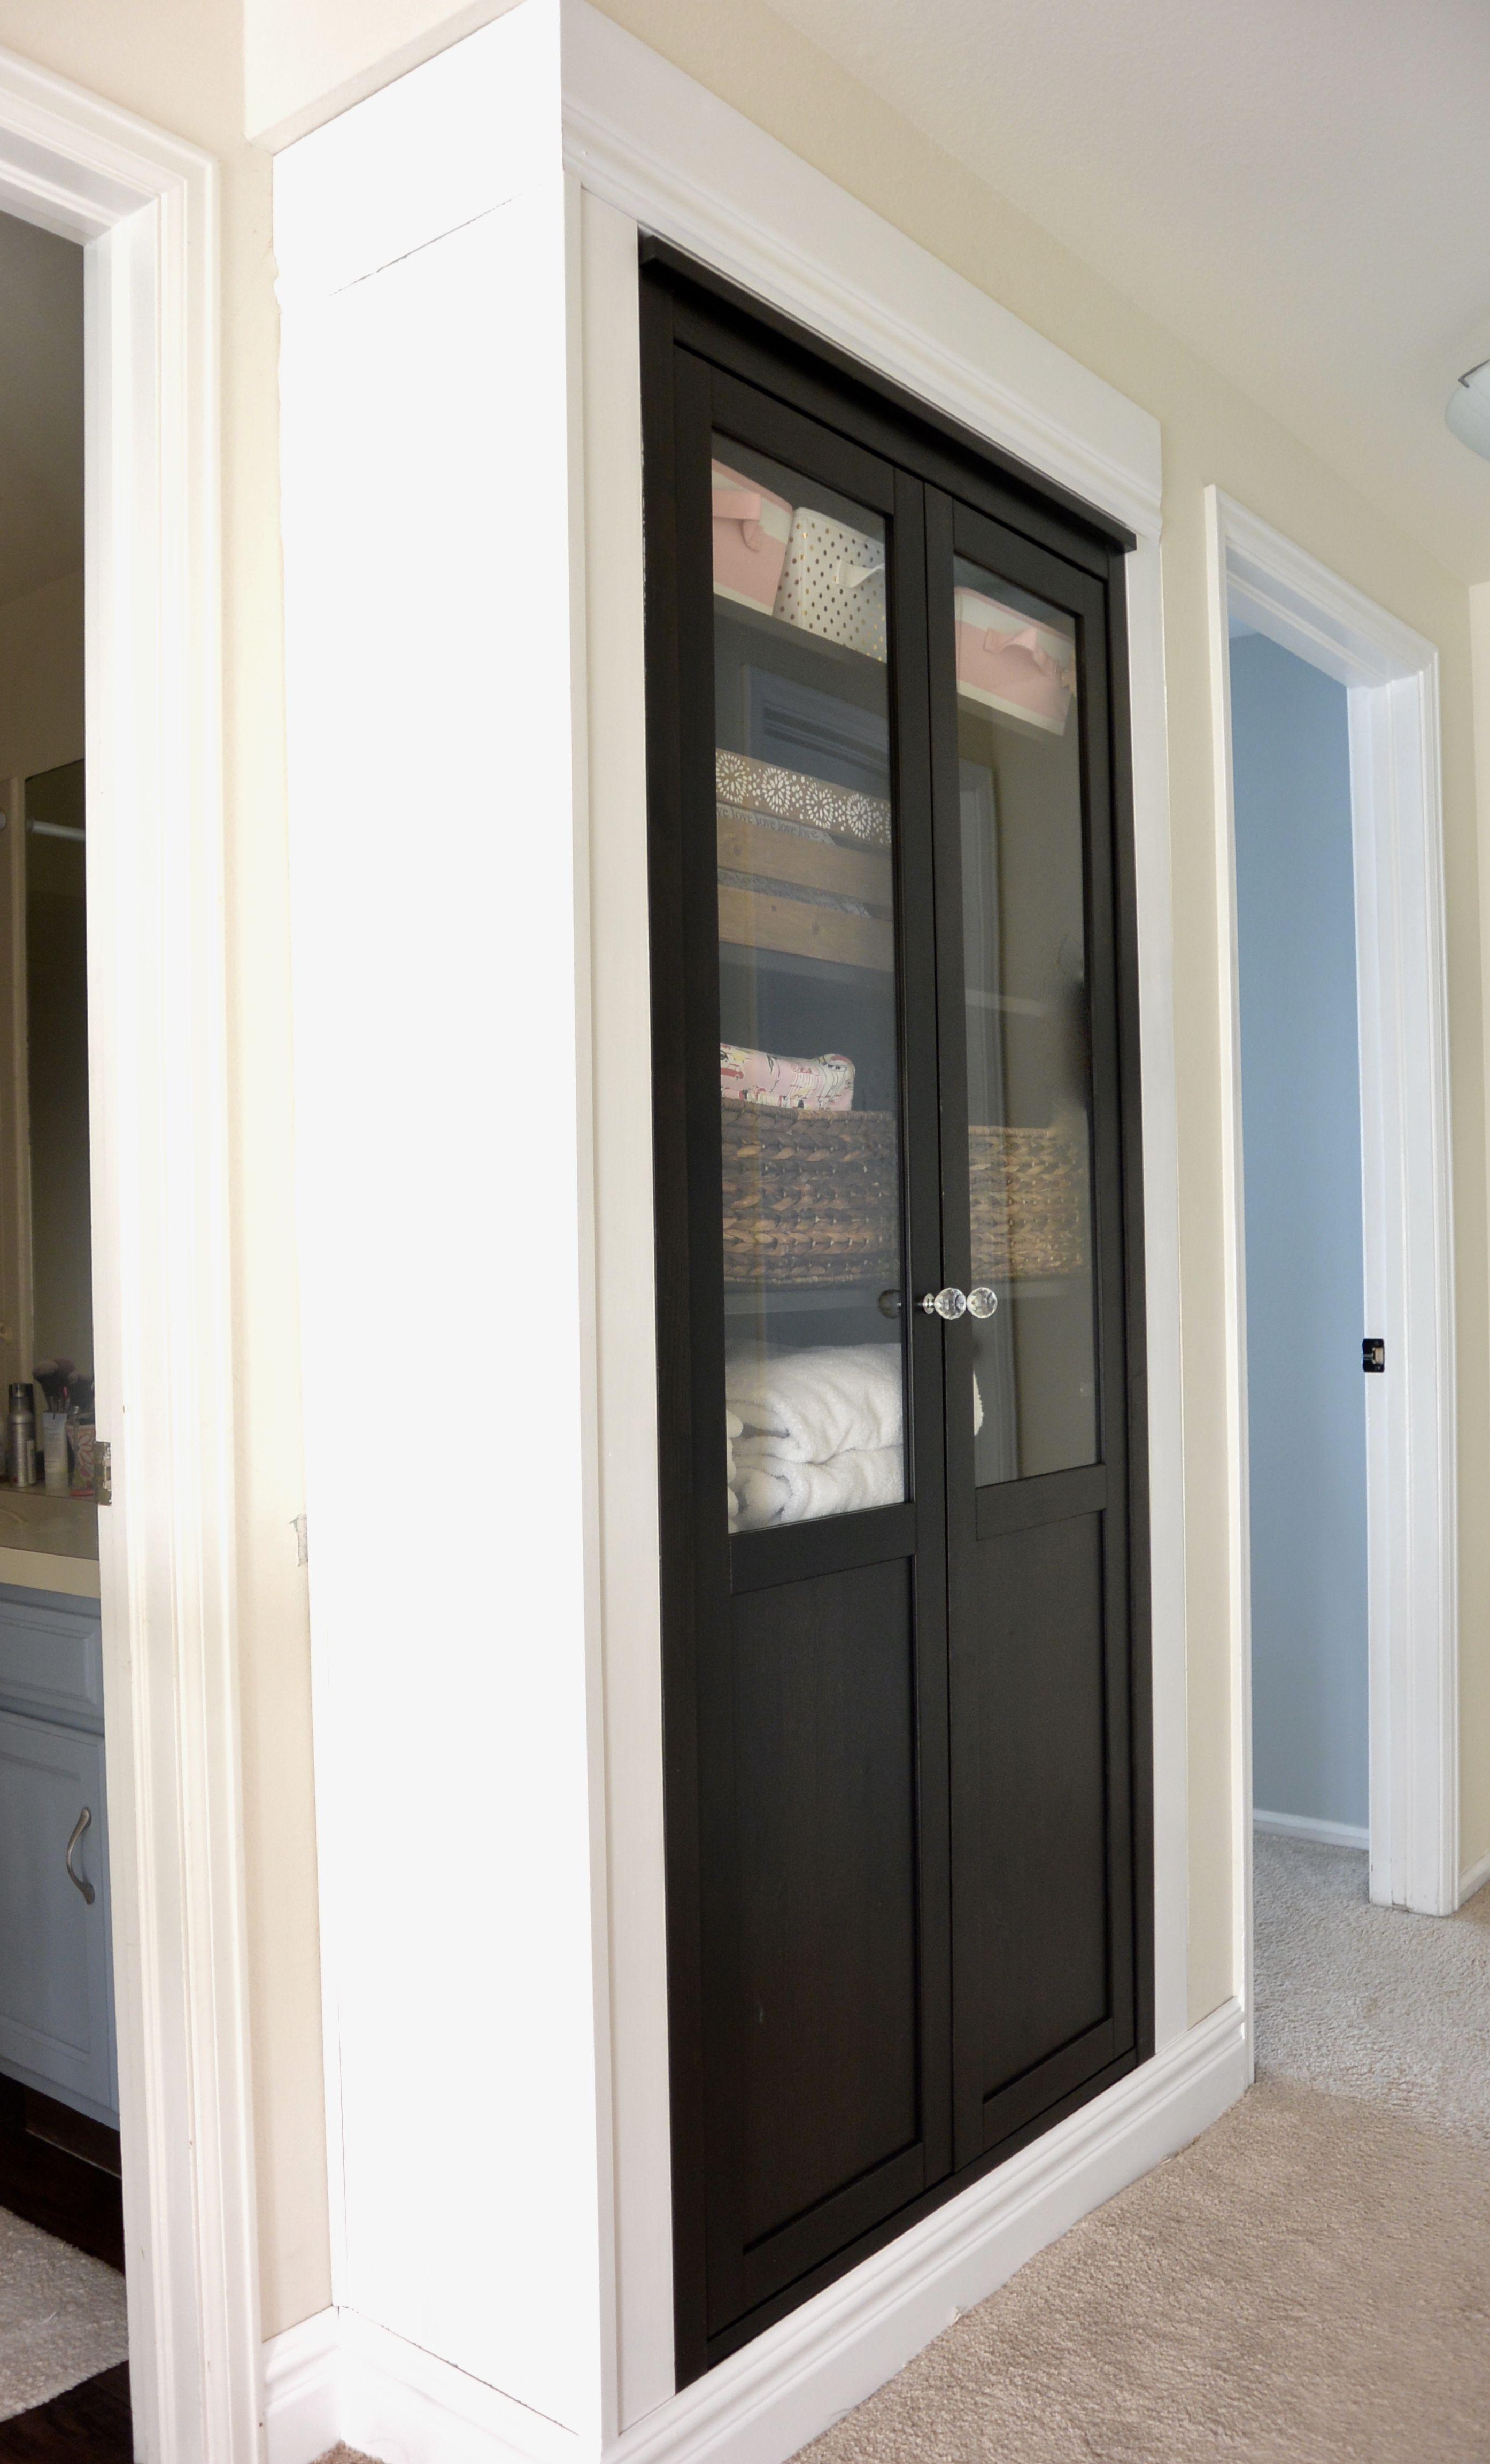 Use An Ikea Hemnes Cabinet As A Linen Closet Bathroom Linen Cabinet Ideal Bathrooms Bathroom Furniture Storage